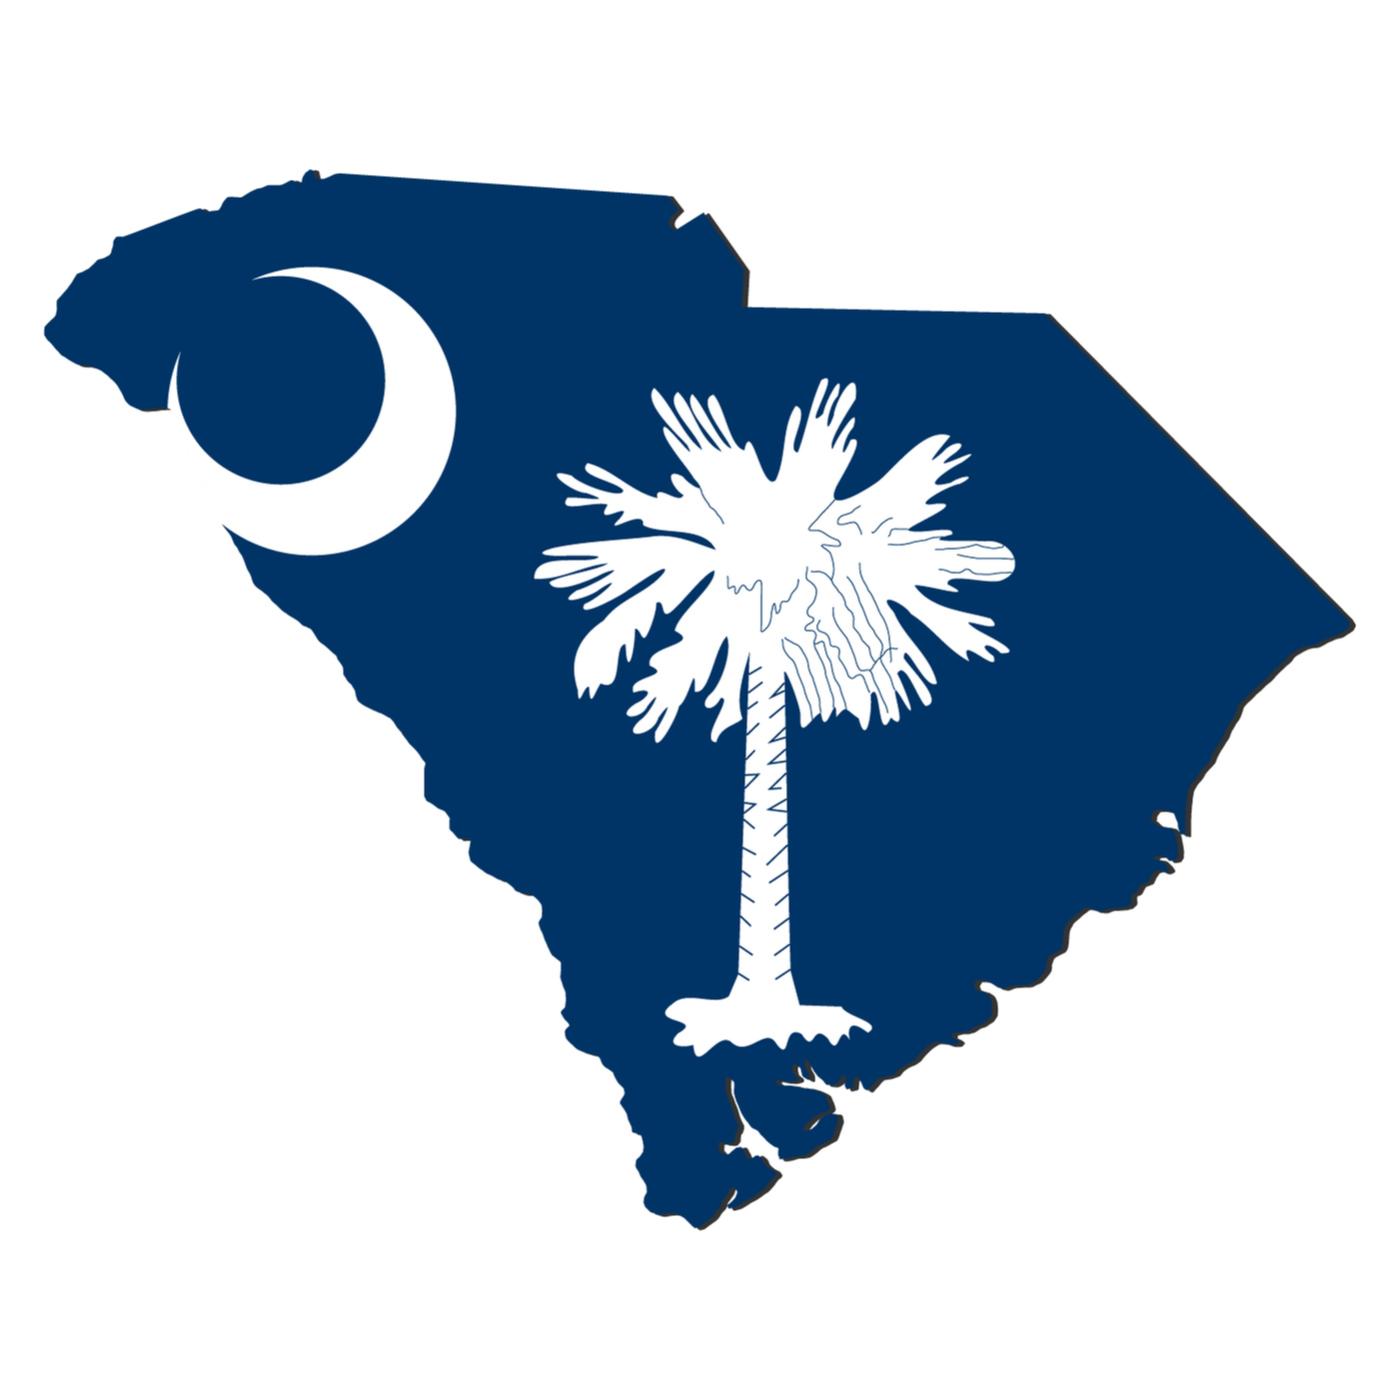 South Carolina Architect Continuing Education Requirements